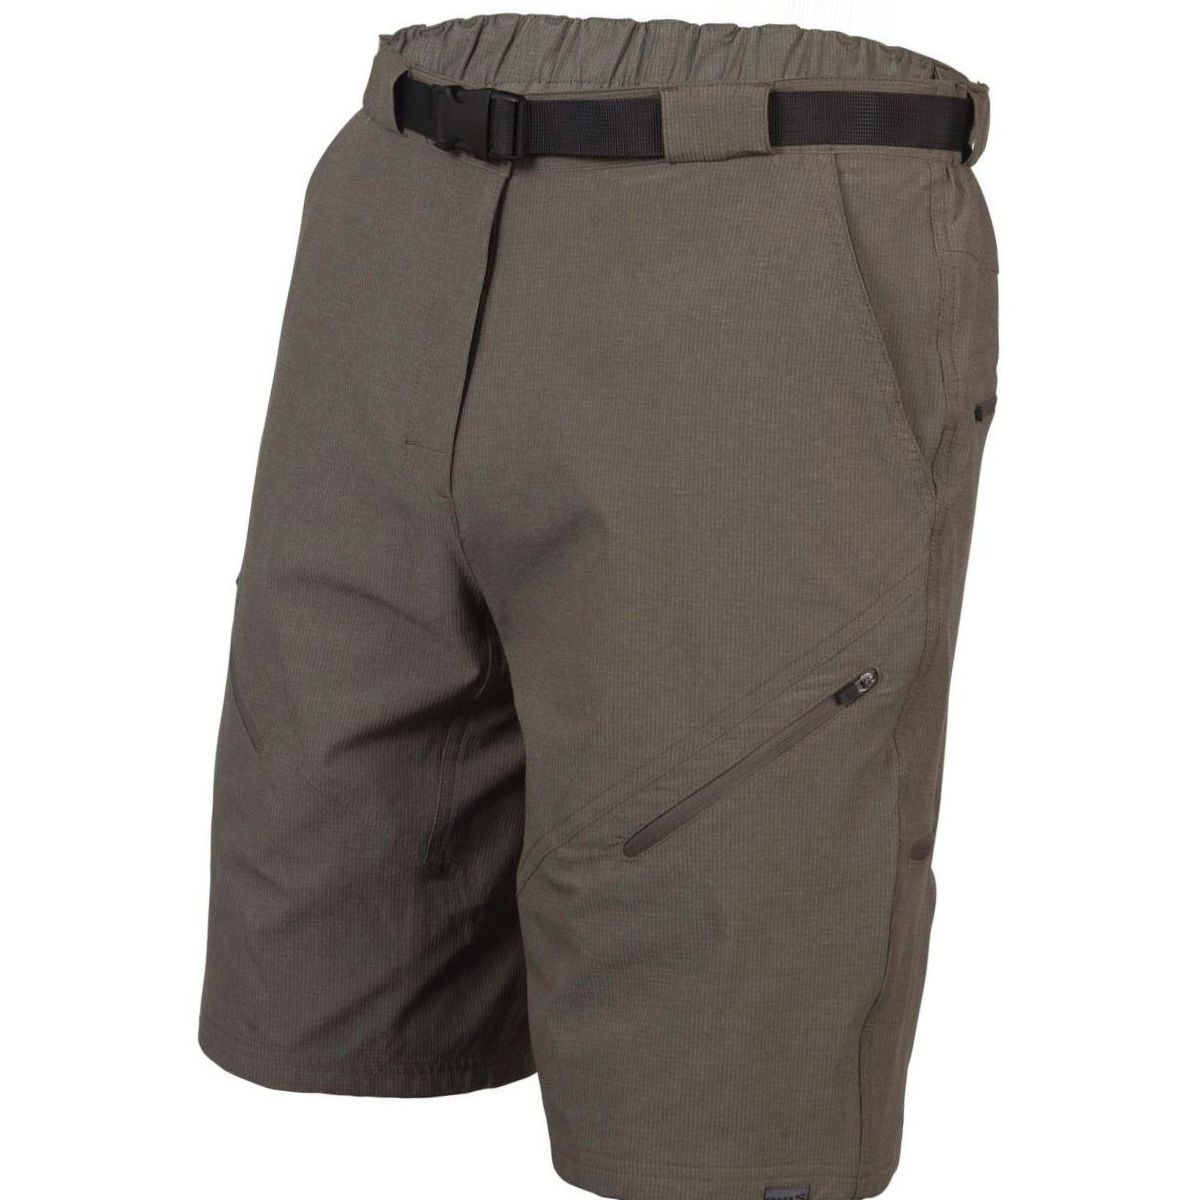 ZOIC Black Market Short + Essential Liner - Men's